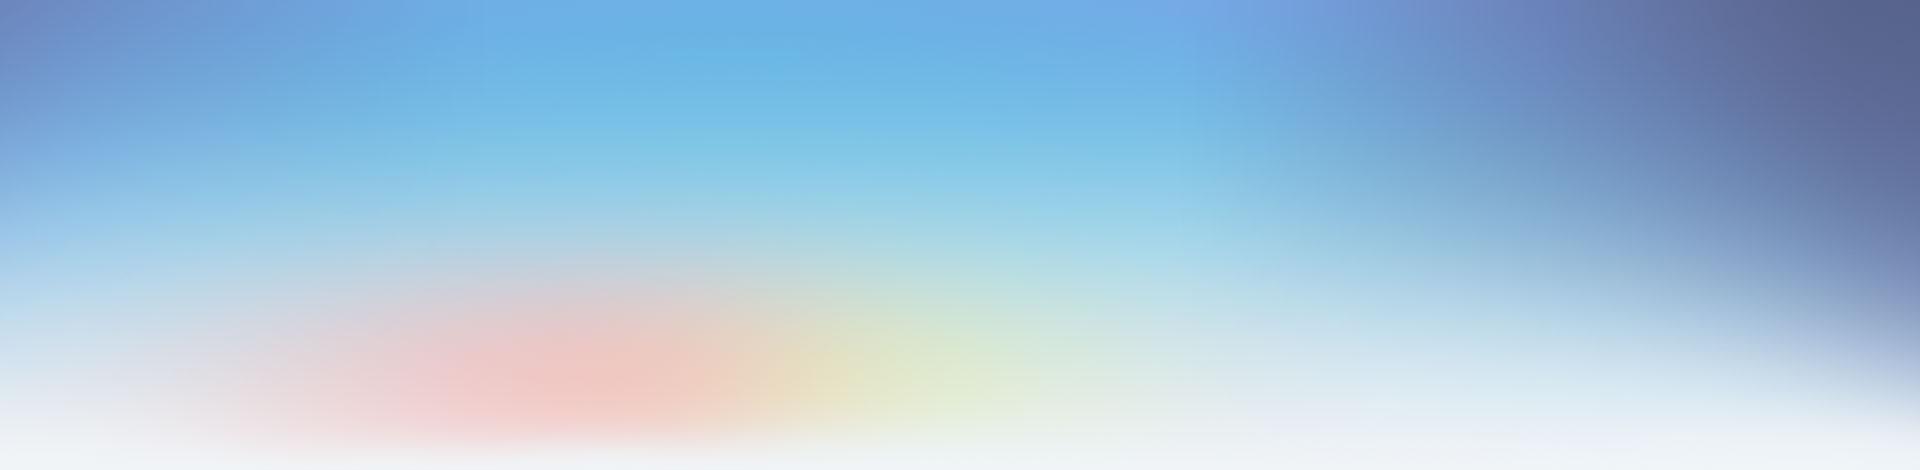 slider_background_3